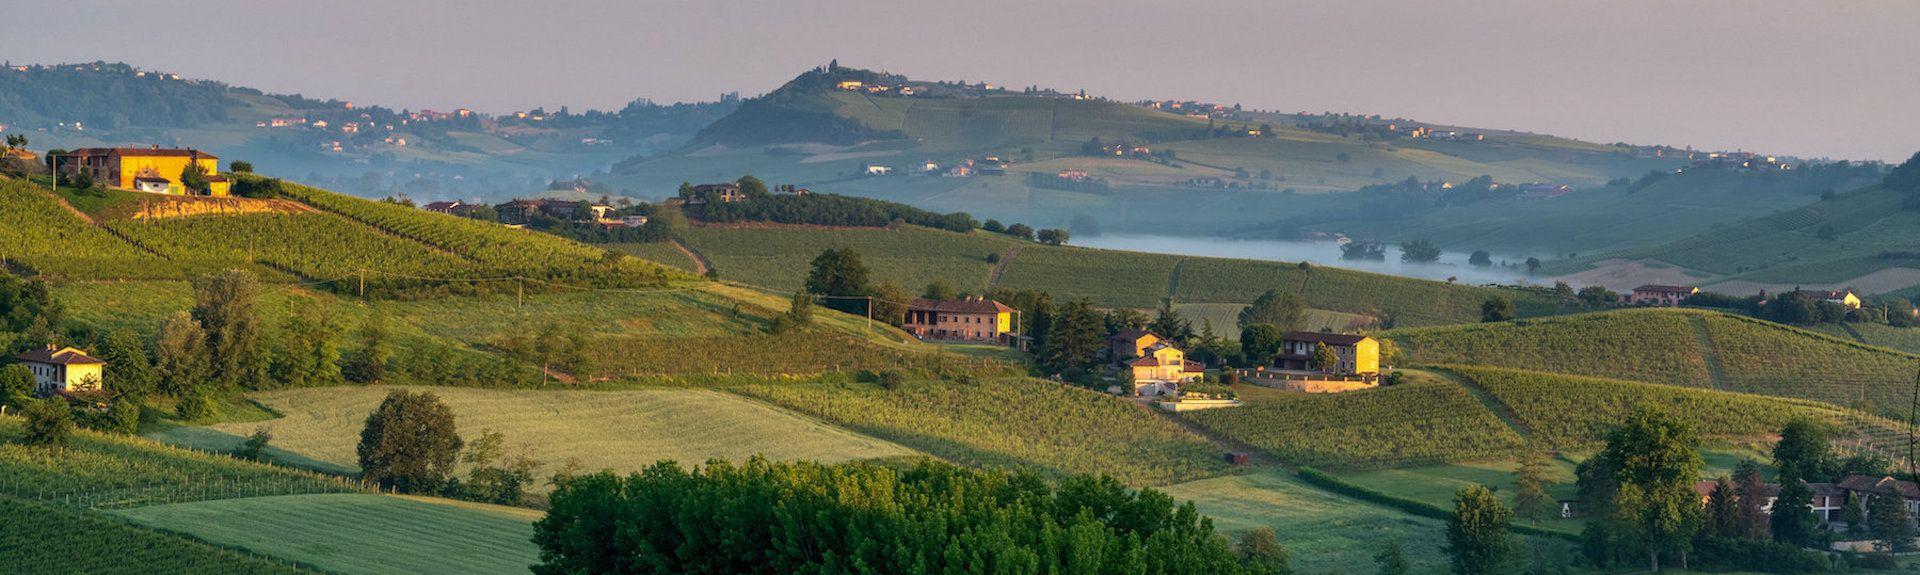 Montaldo Scarampi, Piedmont, Italy